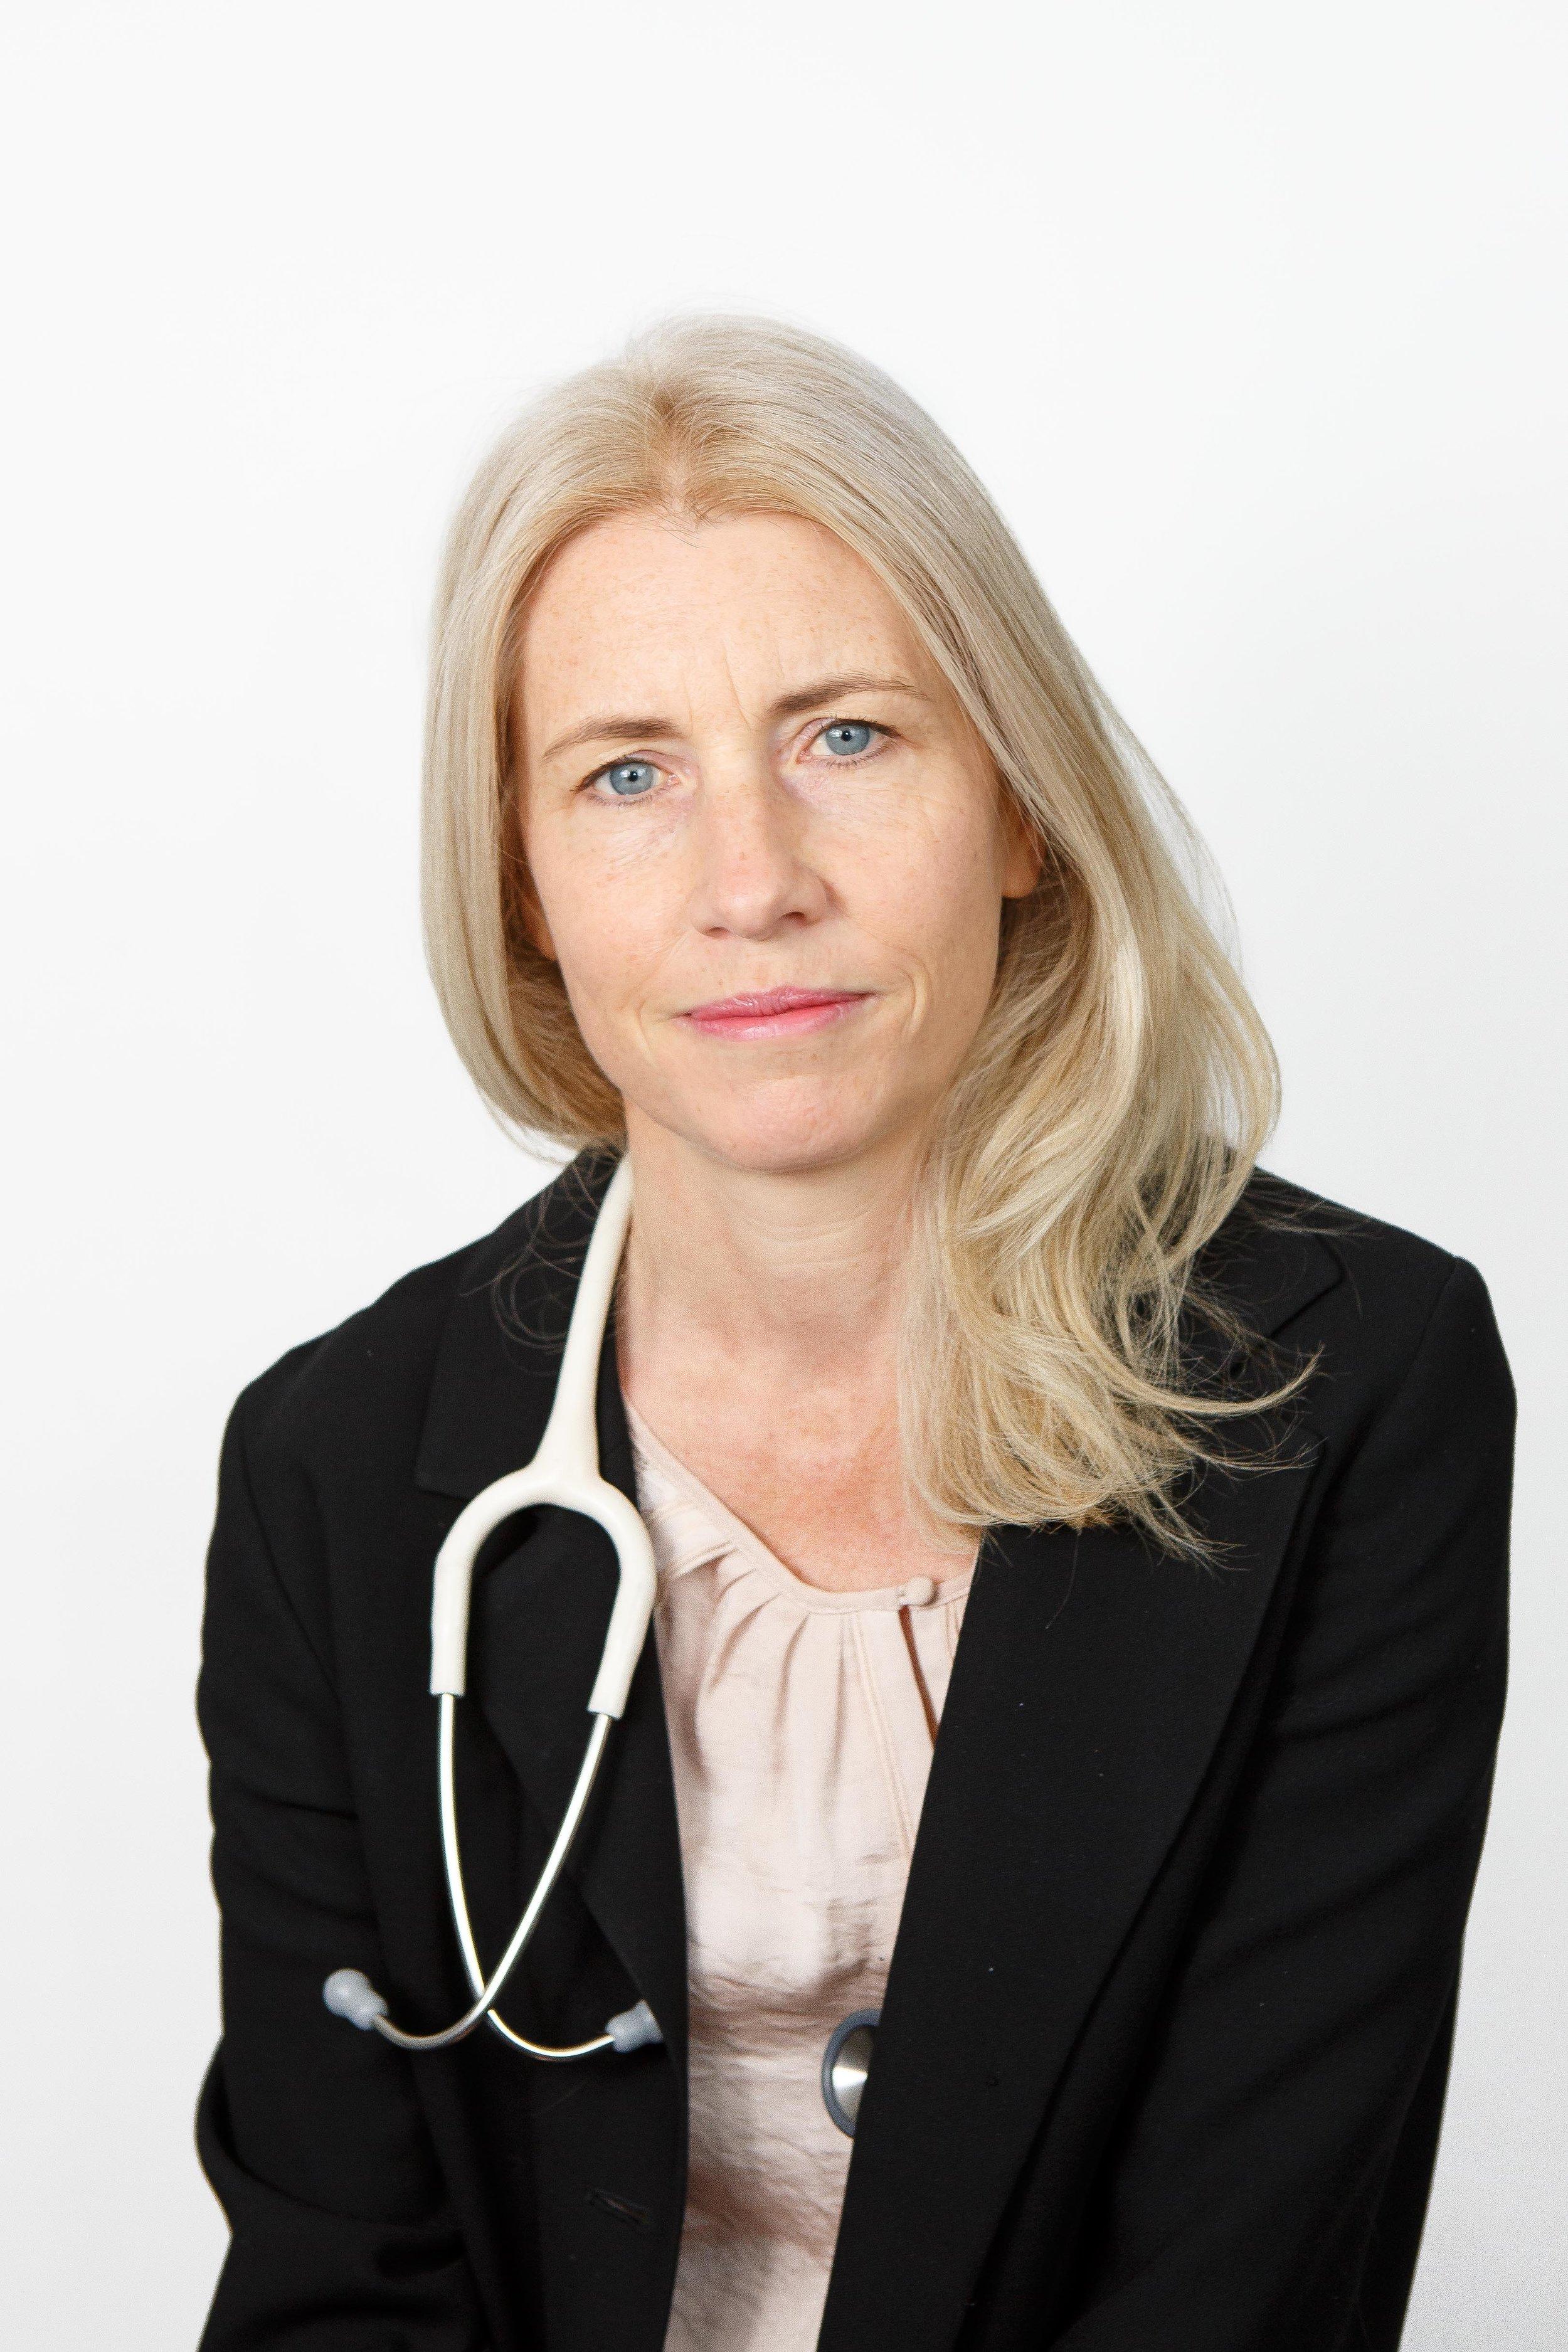 Dr Laura Quinton